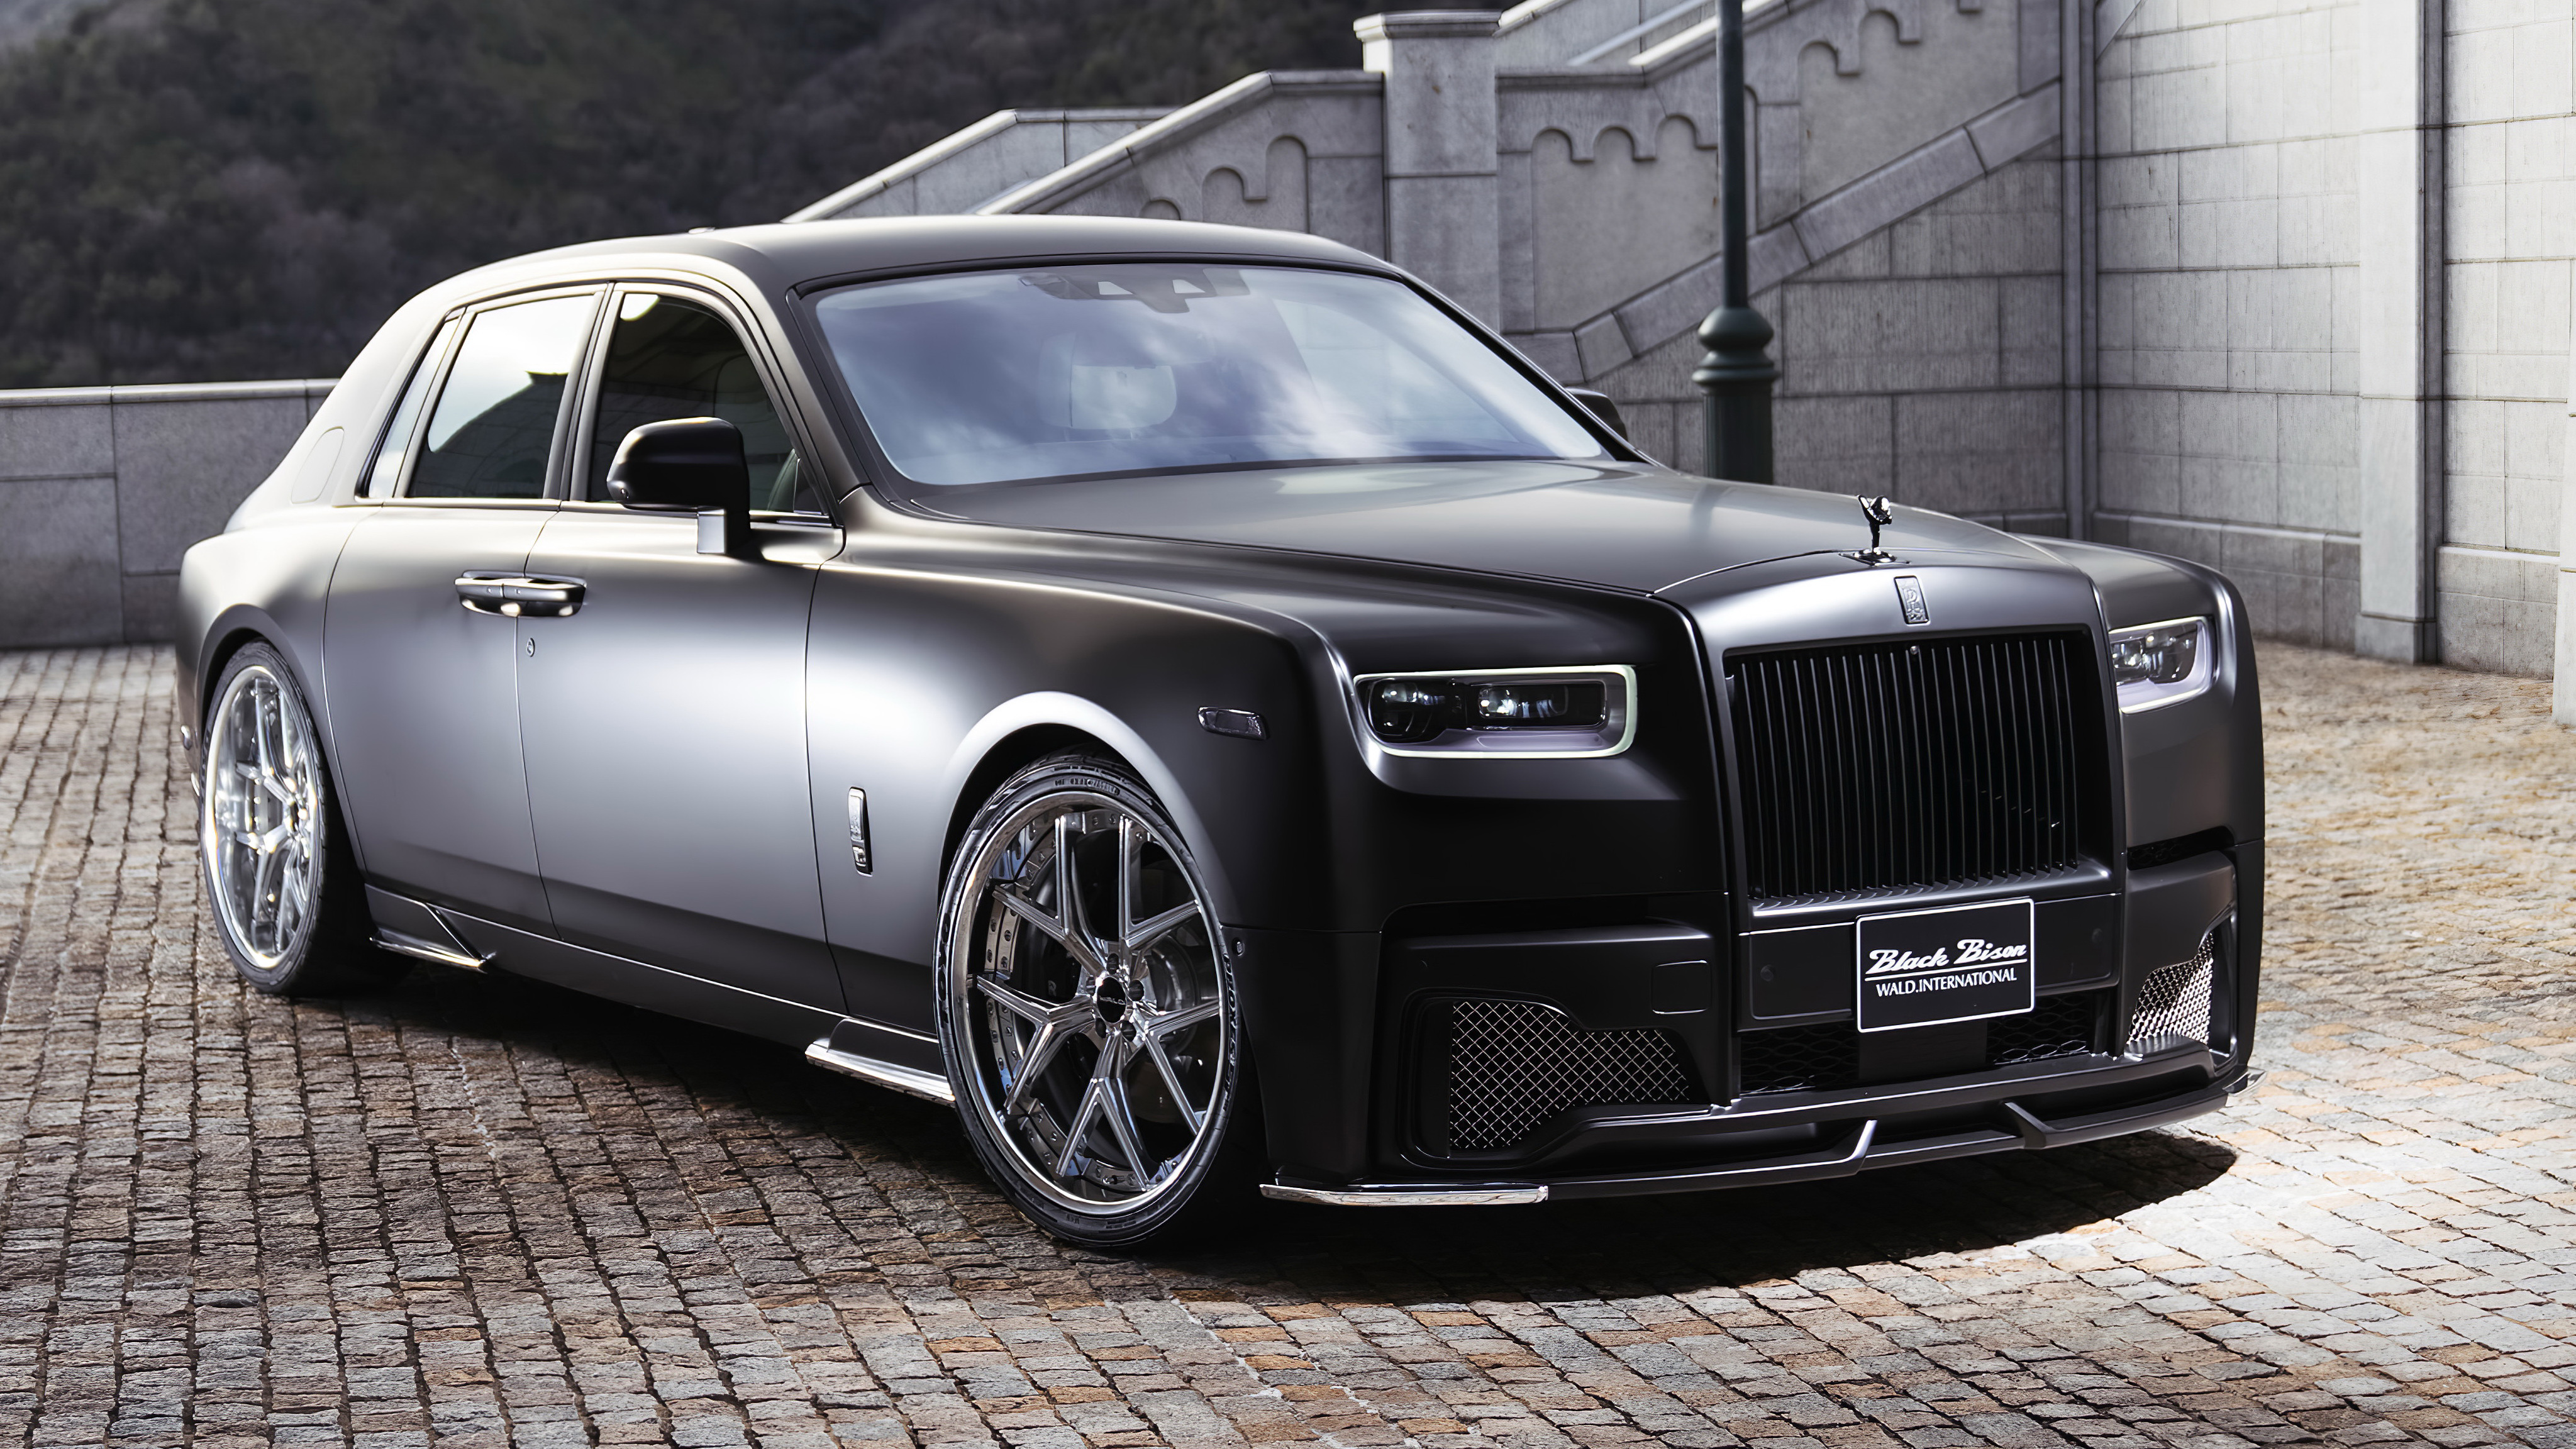 Wald Rolls Royce Phantom Sports Line Black Bison Edition 2019 4k 2 Wallpaper Hd Car Wallpapers Id 12671